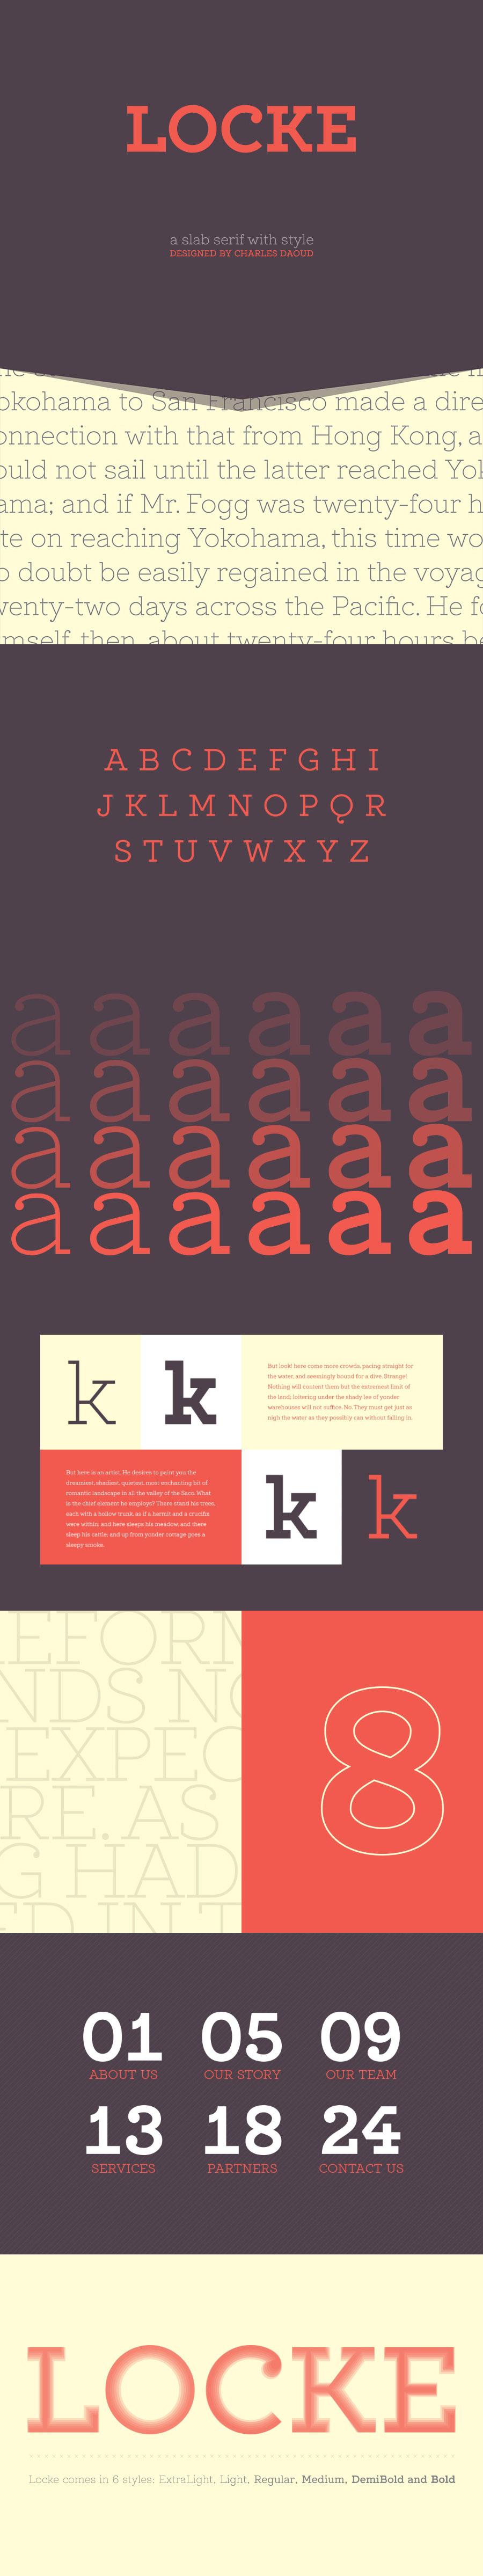 Locke typeface